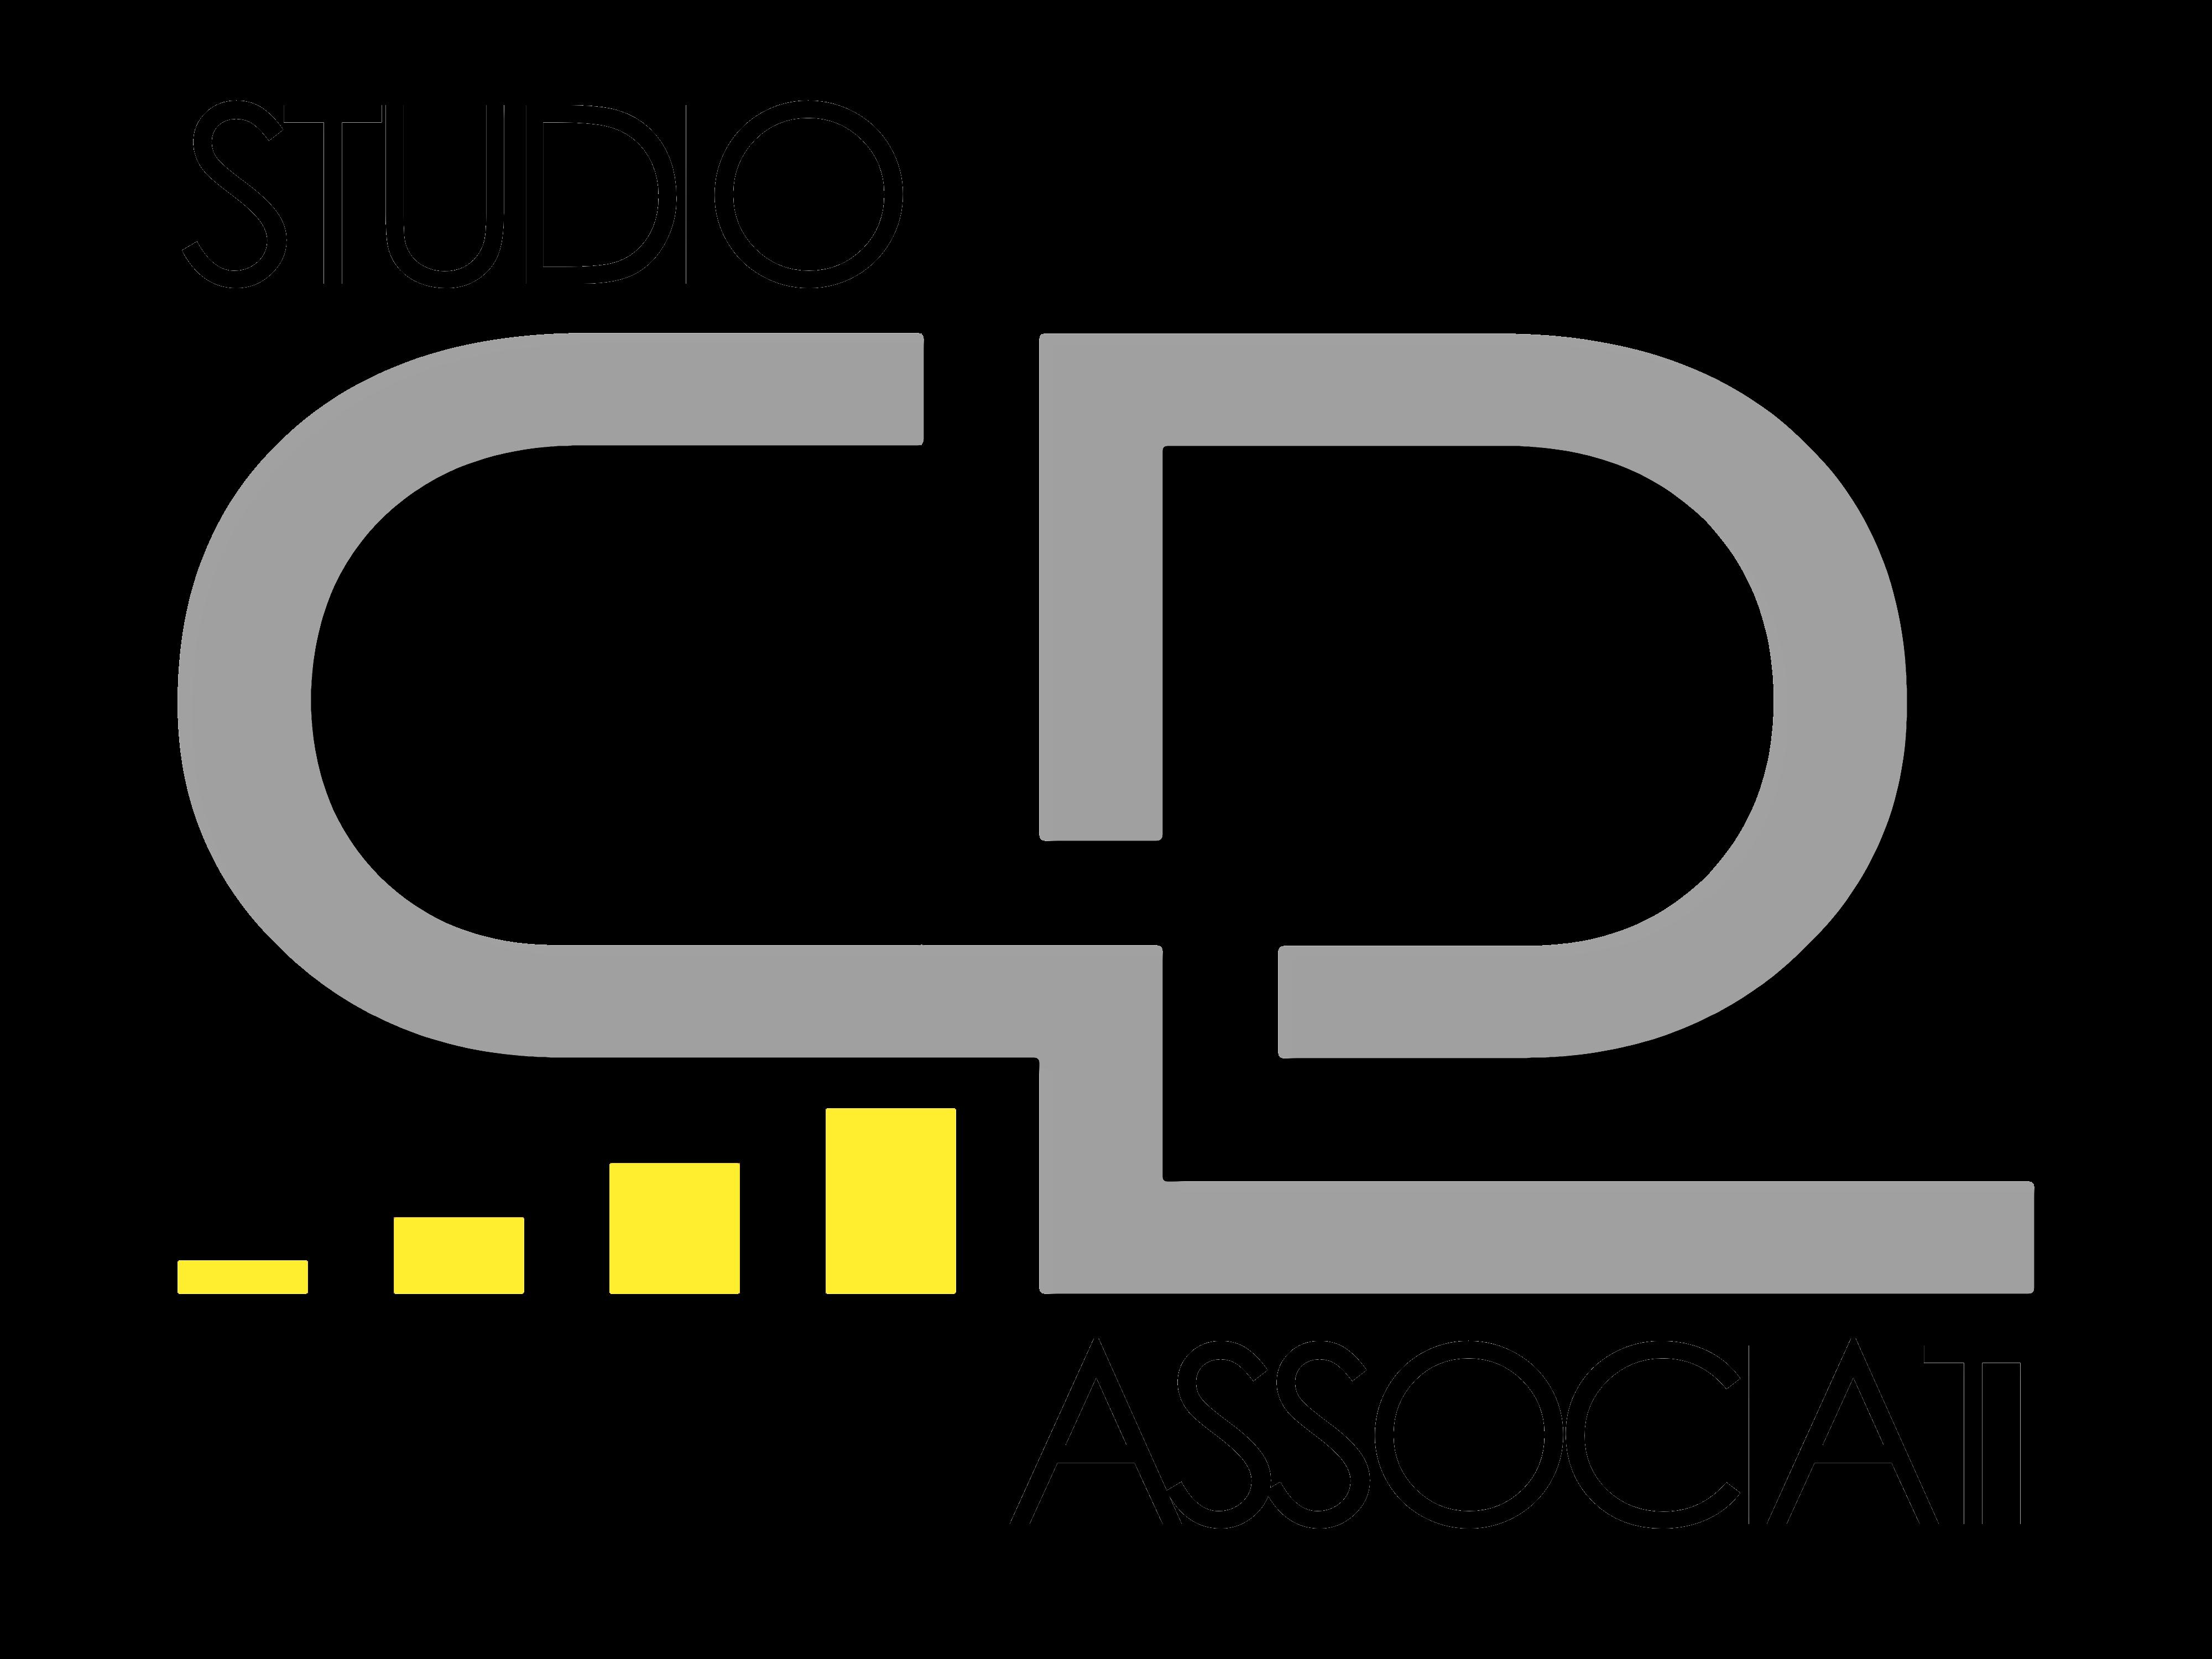 Studio C.D.L. Associati